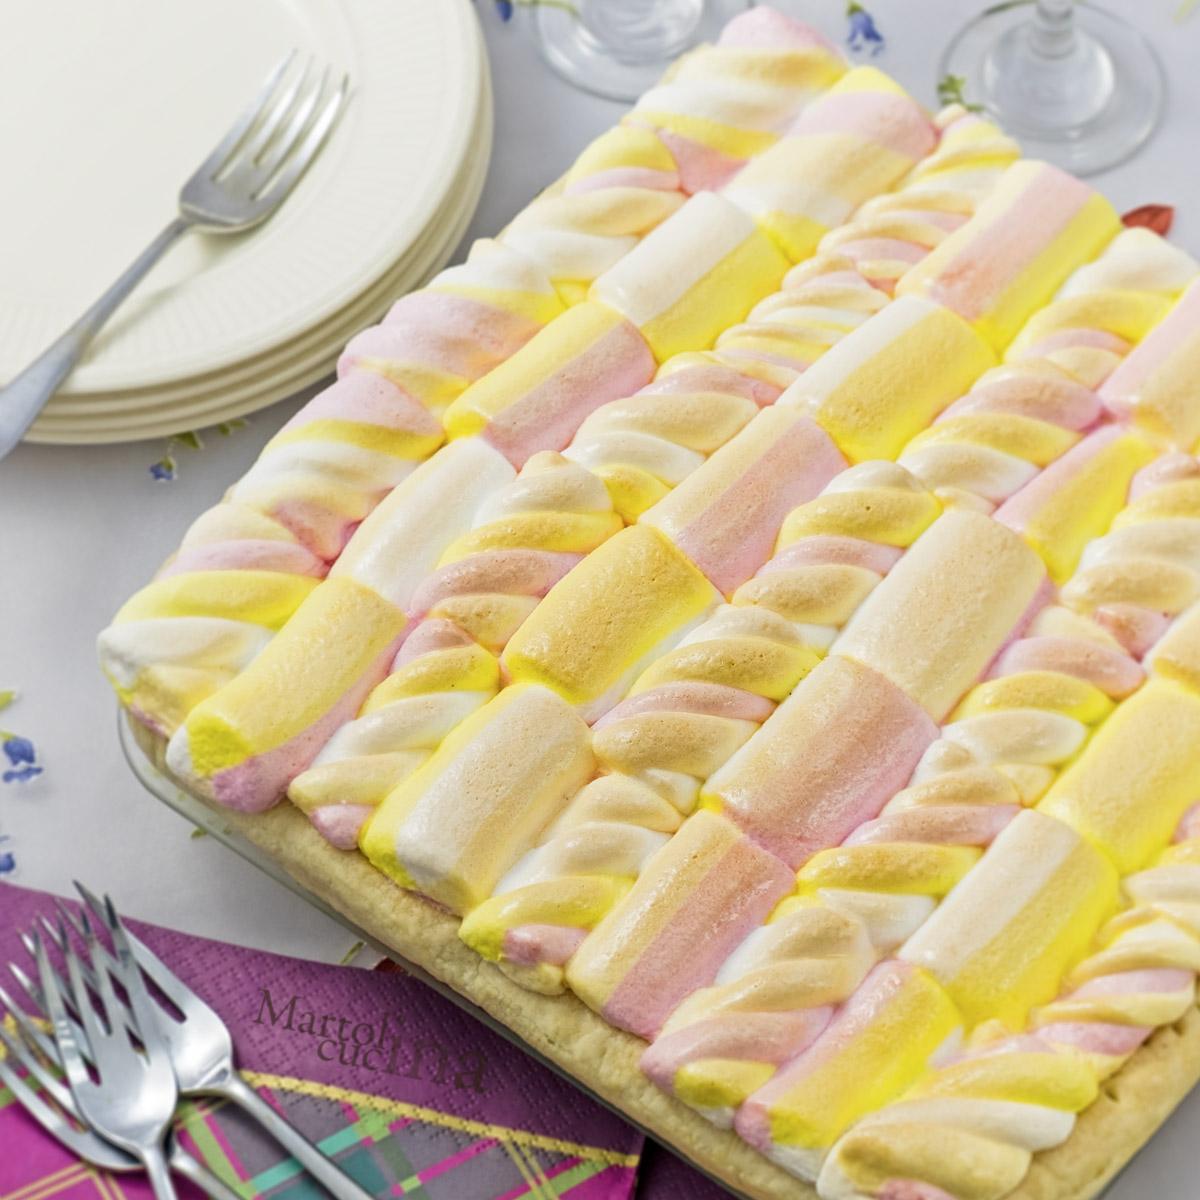 Crostata con cioccolato fondente e marshmallows